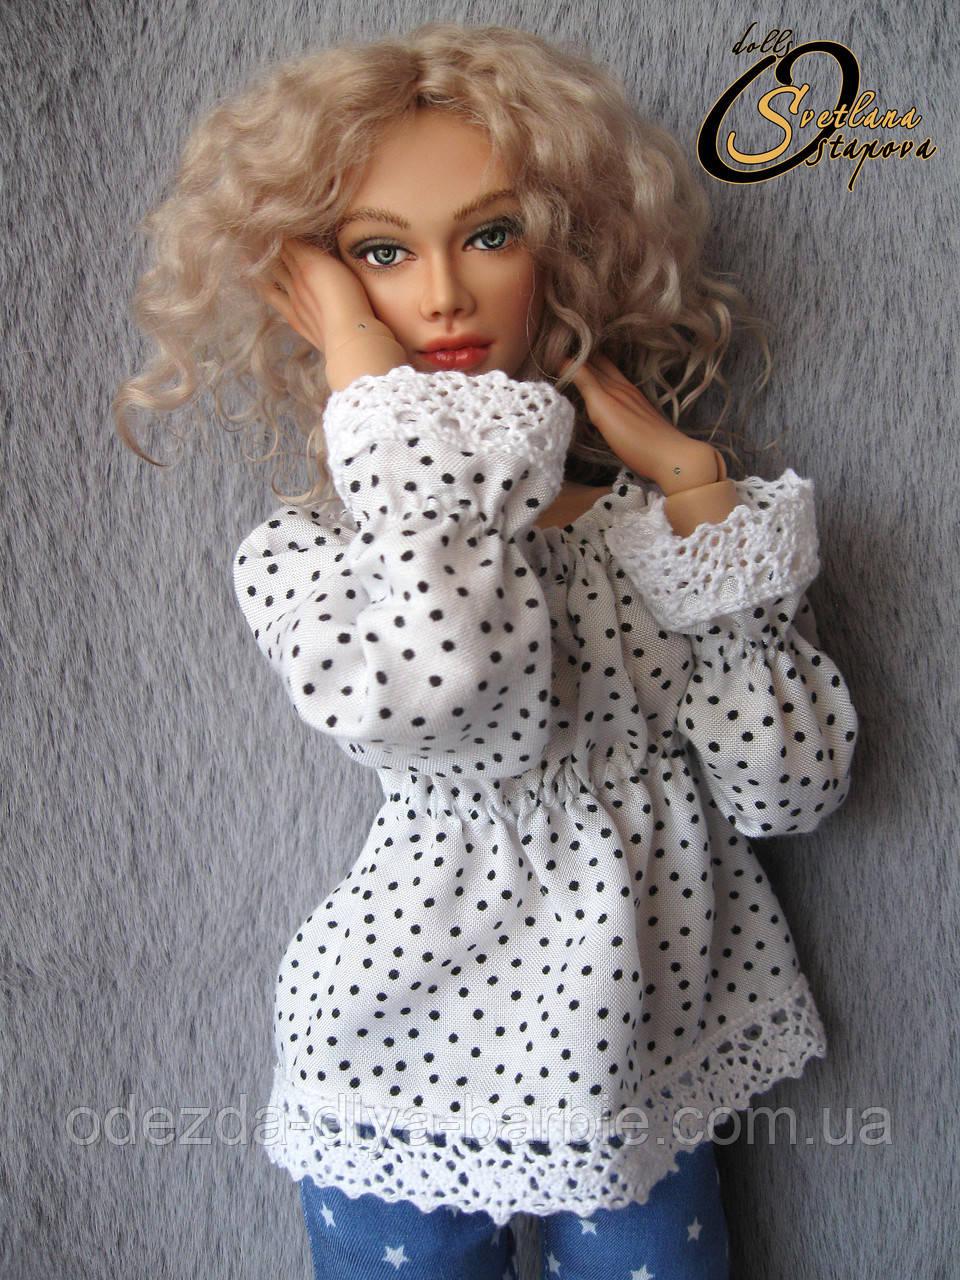 Авторская шарнирная кукла Эмма, МСД. Полиуретан